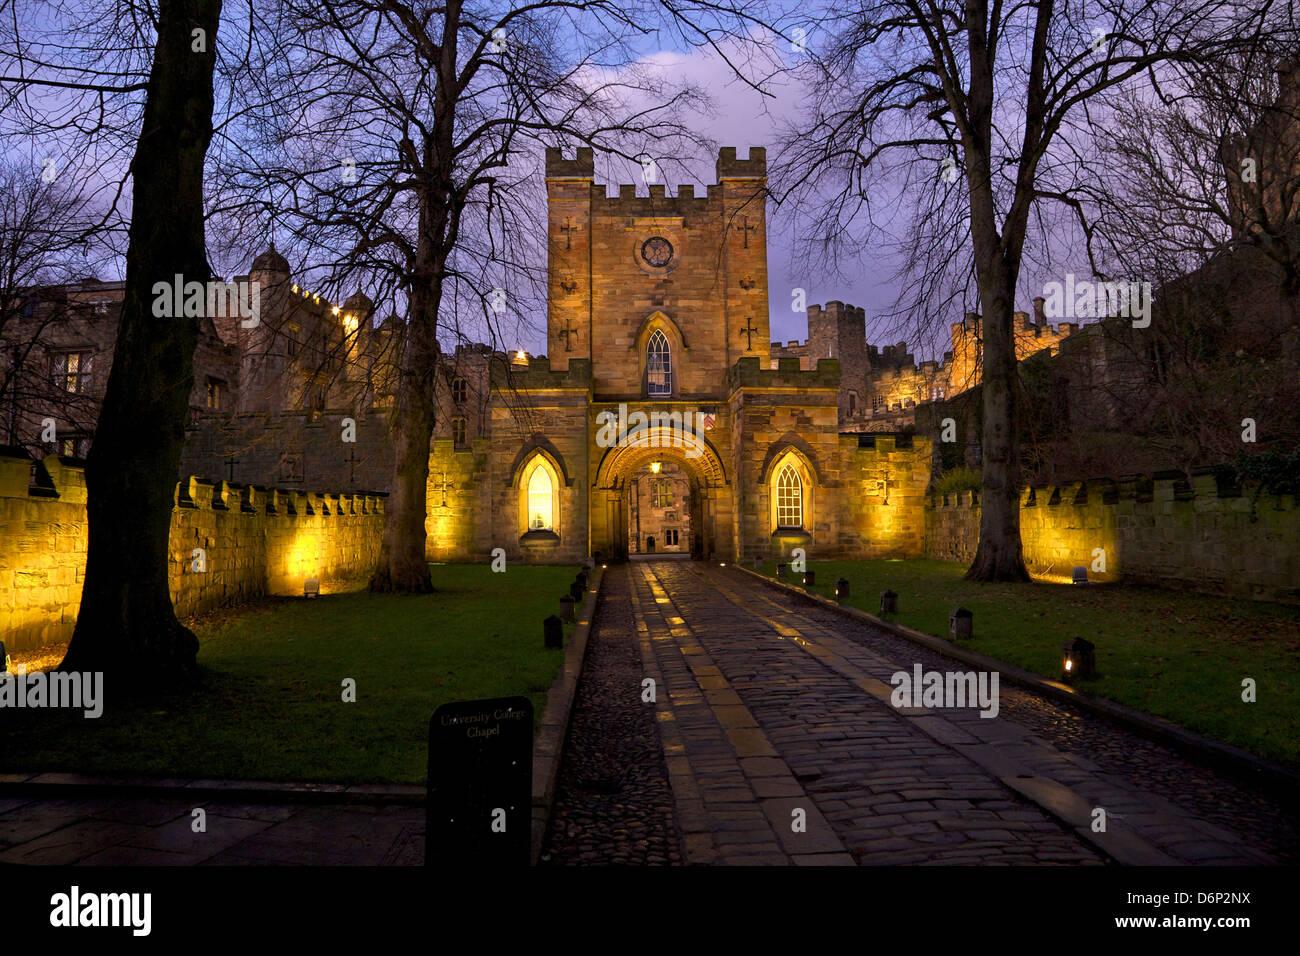 Gatehouse, château de Durham, University College, Durham, Angleterre, Royaume-Uni, Europe Photo Stock